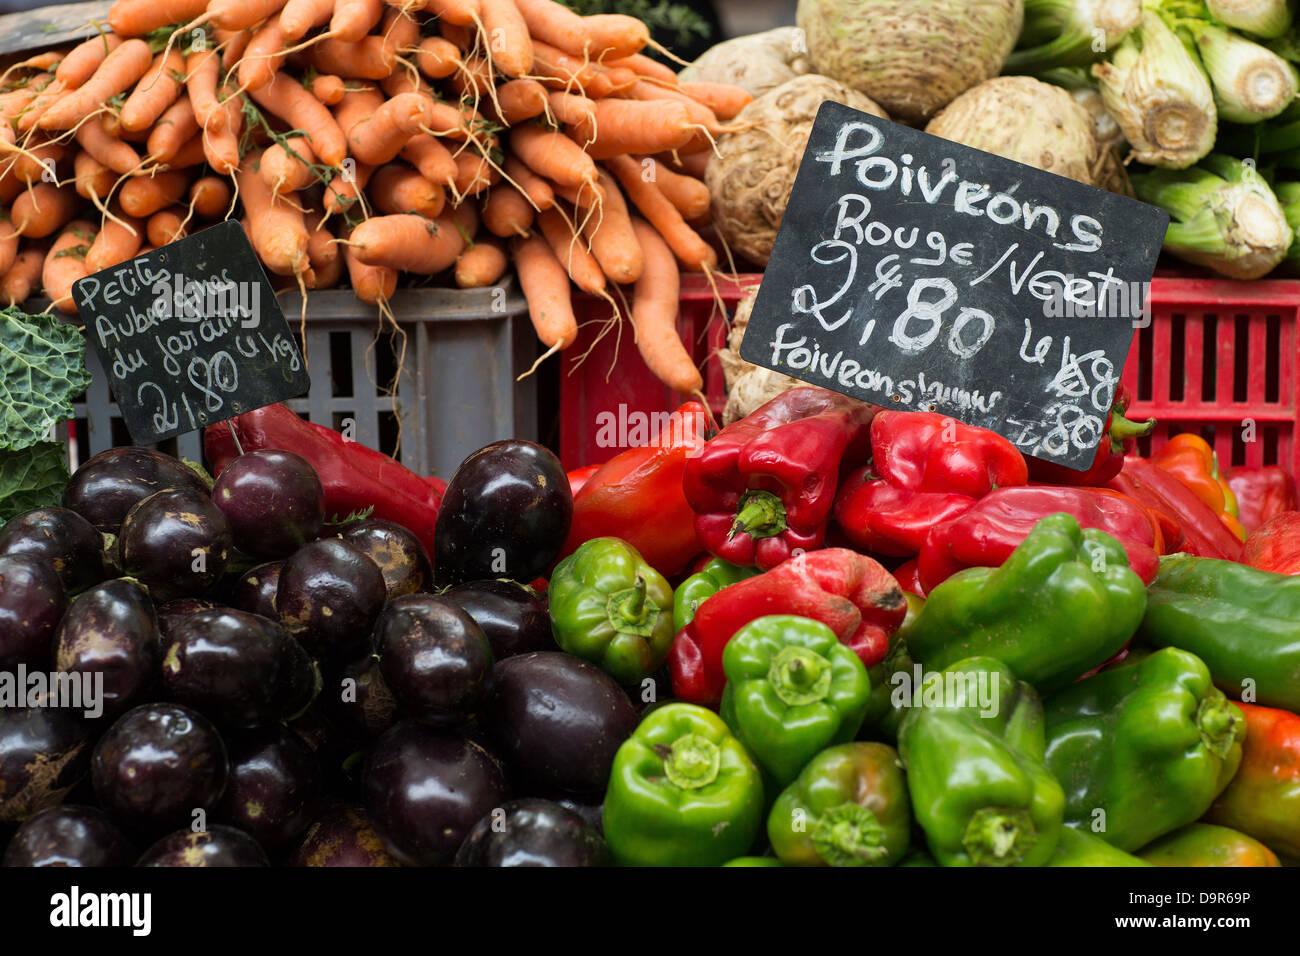 the market at Aix en Provence, France - Stock Image